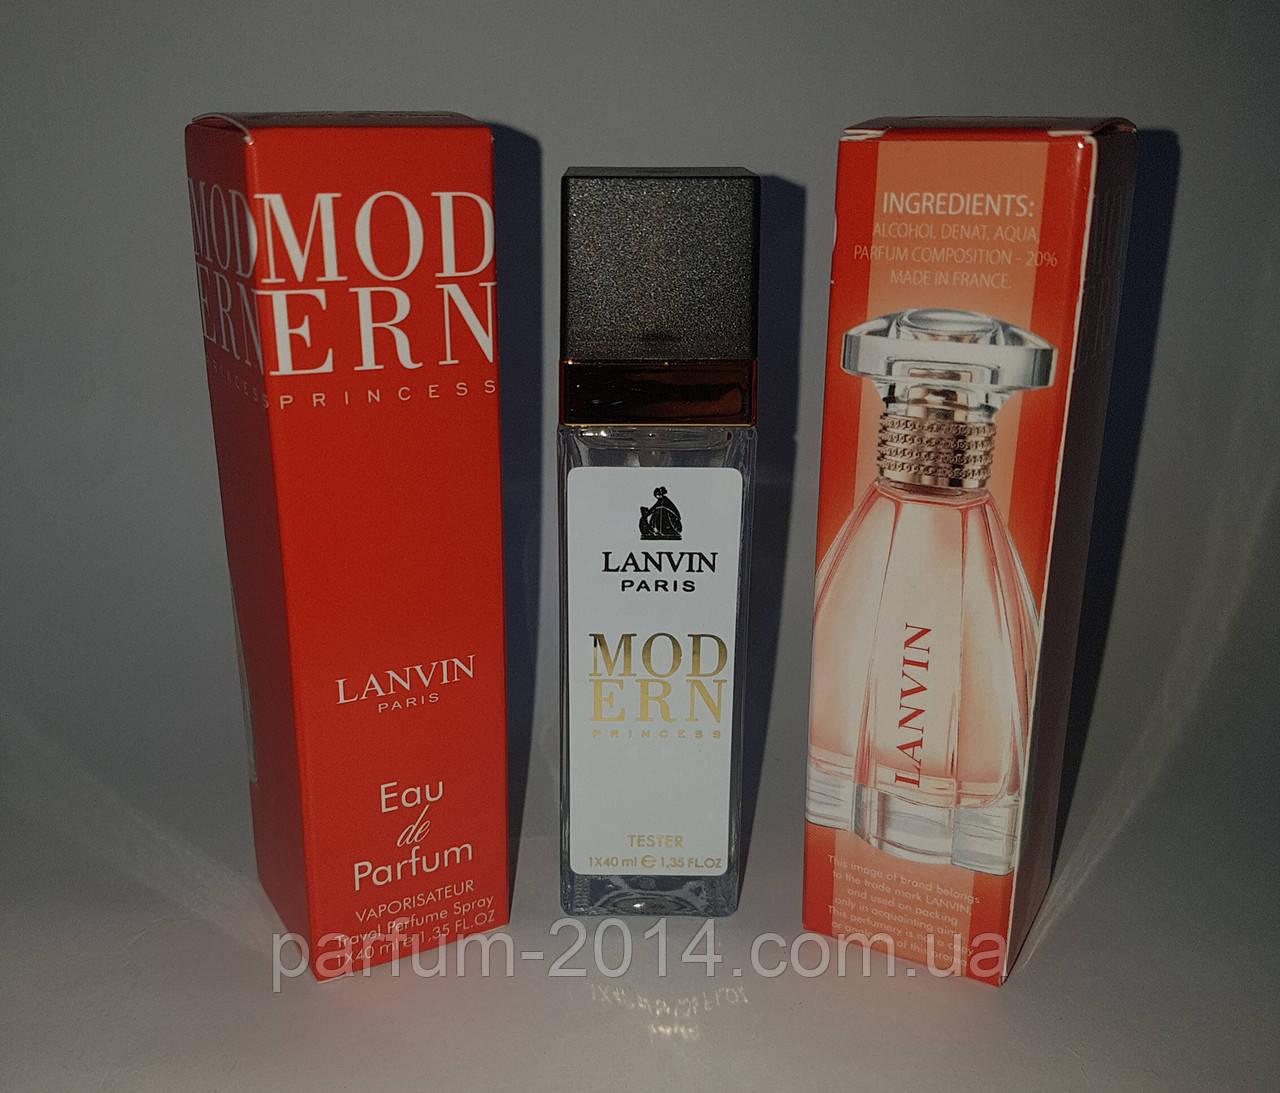 Мини парфюм Lanvin Modern Princess 40 ml (реплика)